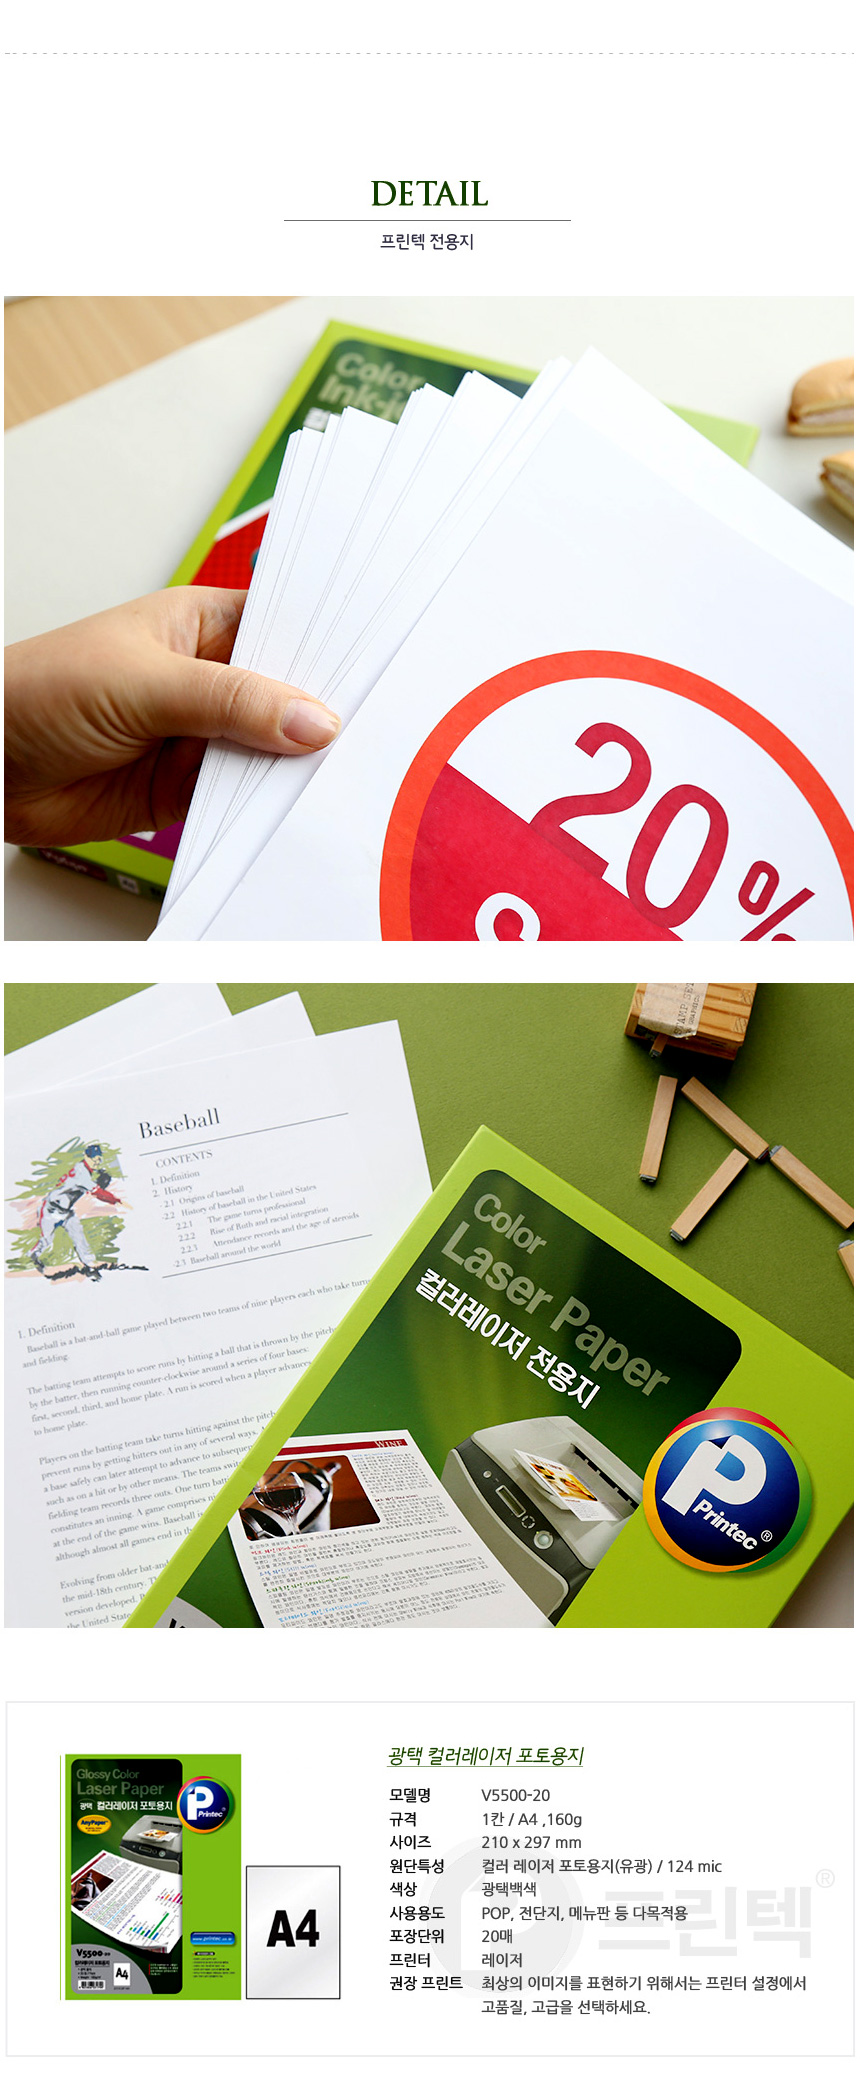 printec_a4_glossy_laser_paper_v5500-20_02.jpg